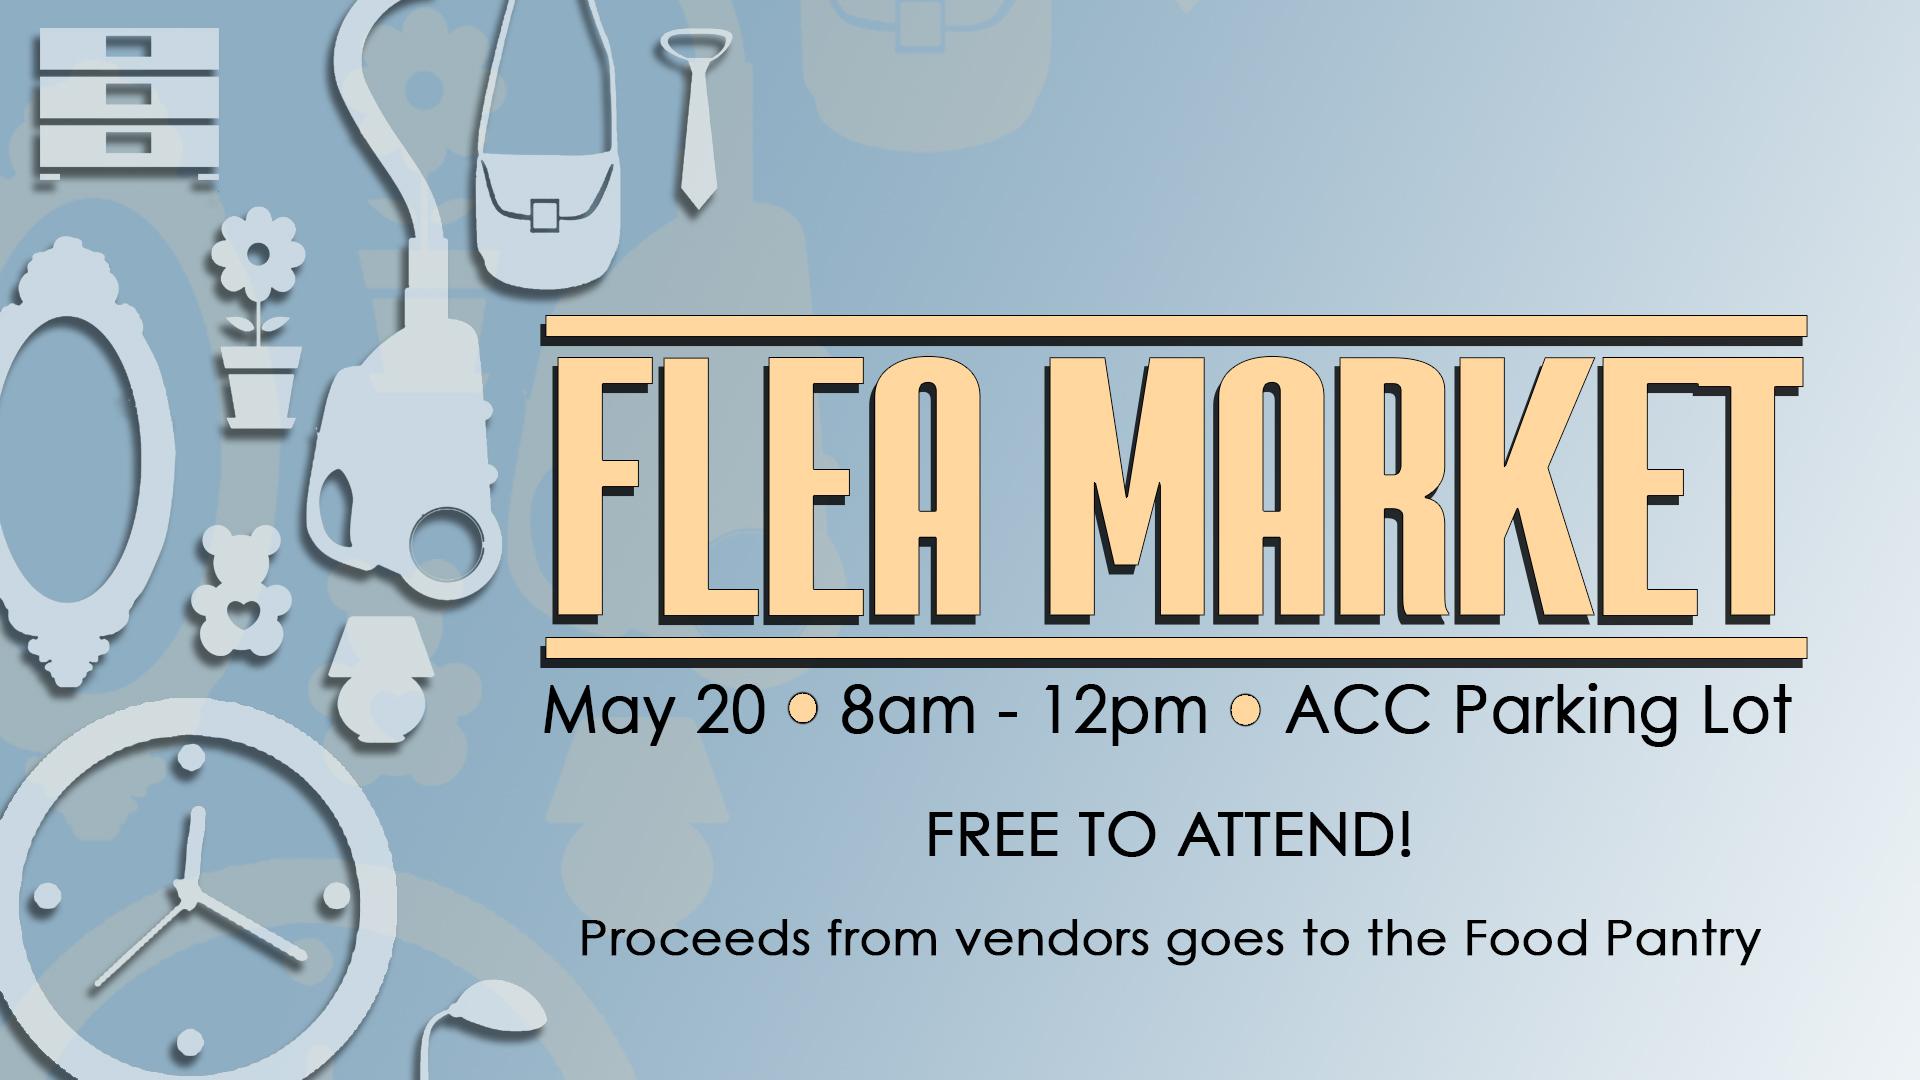 Flea Market 2017